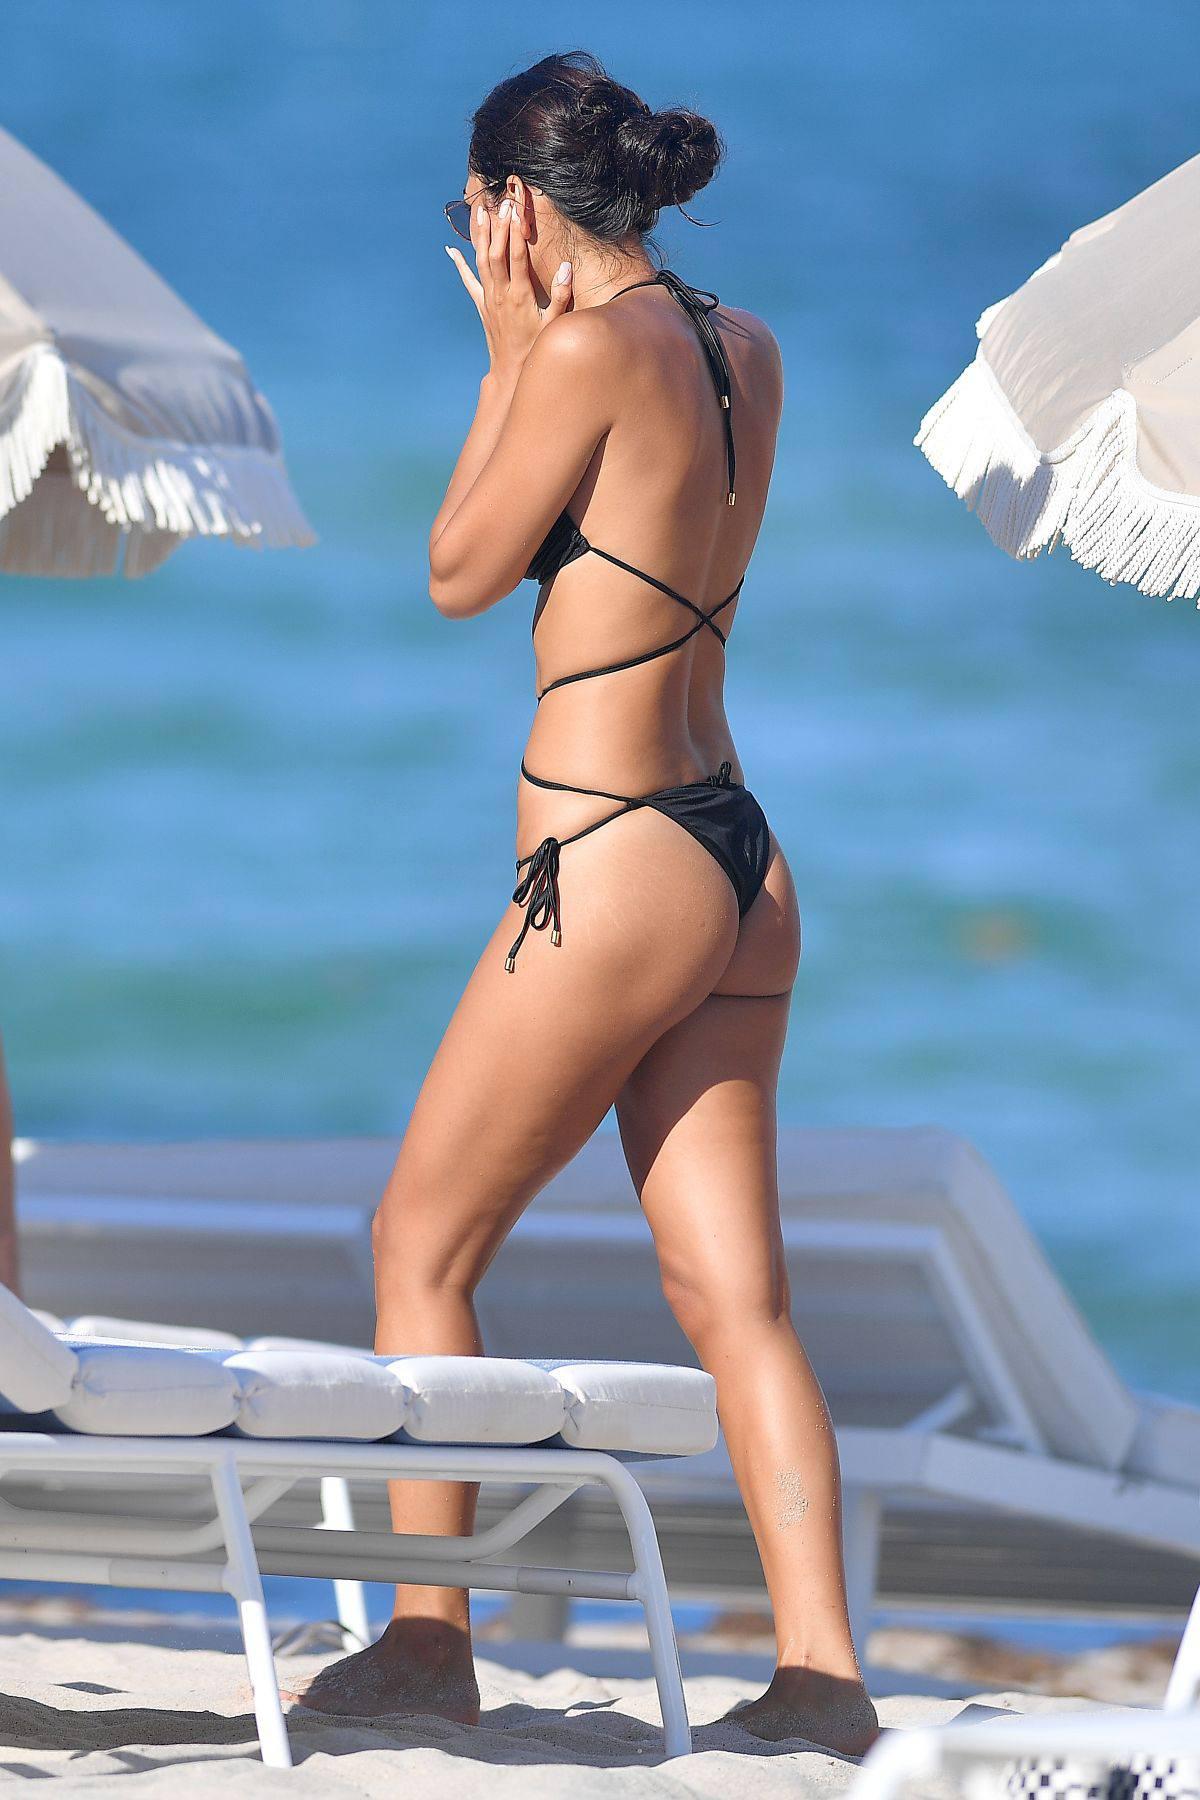 Ambra Gutierrez – Beautiful Body In Small Bikini At The Beach In Miami Beach 0017